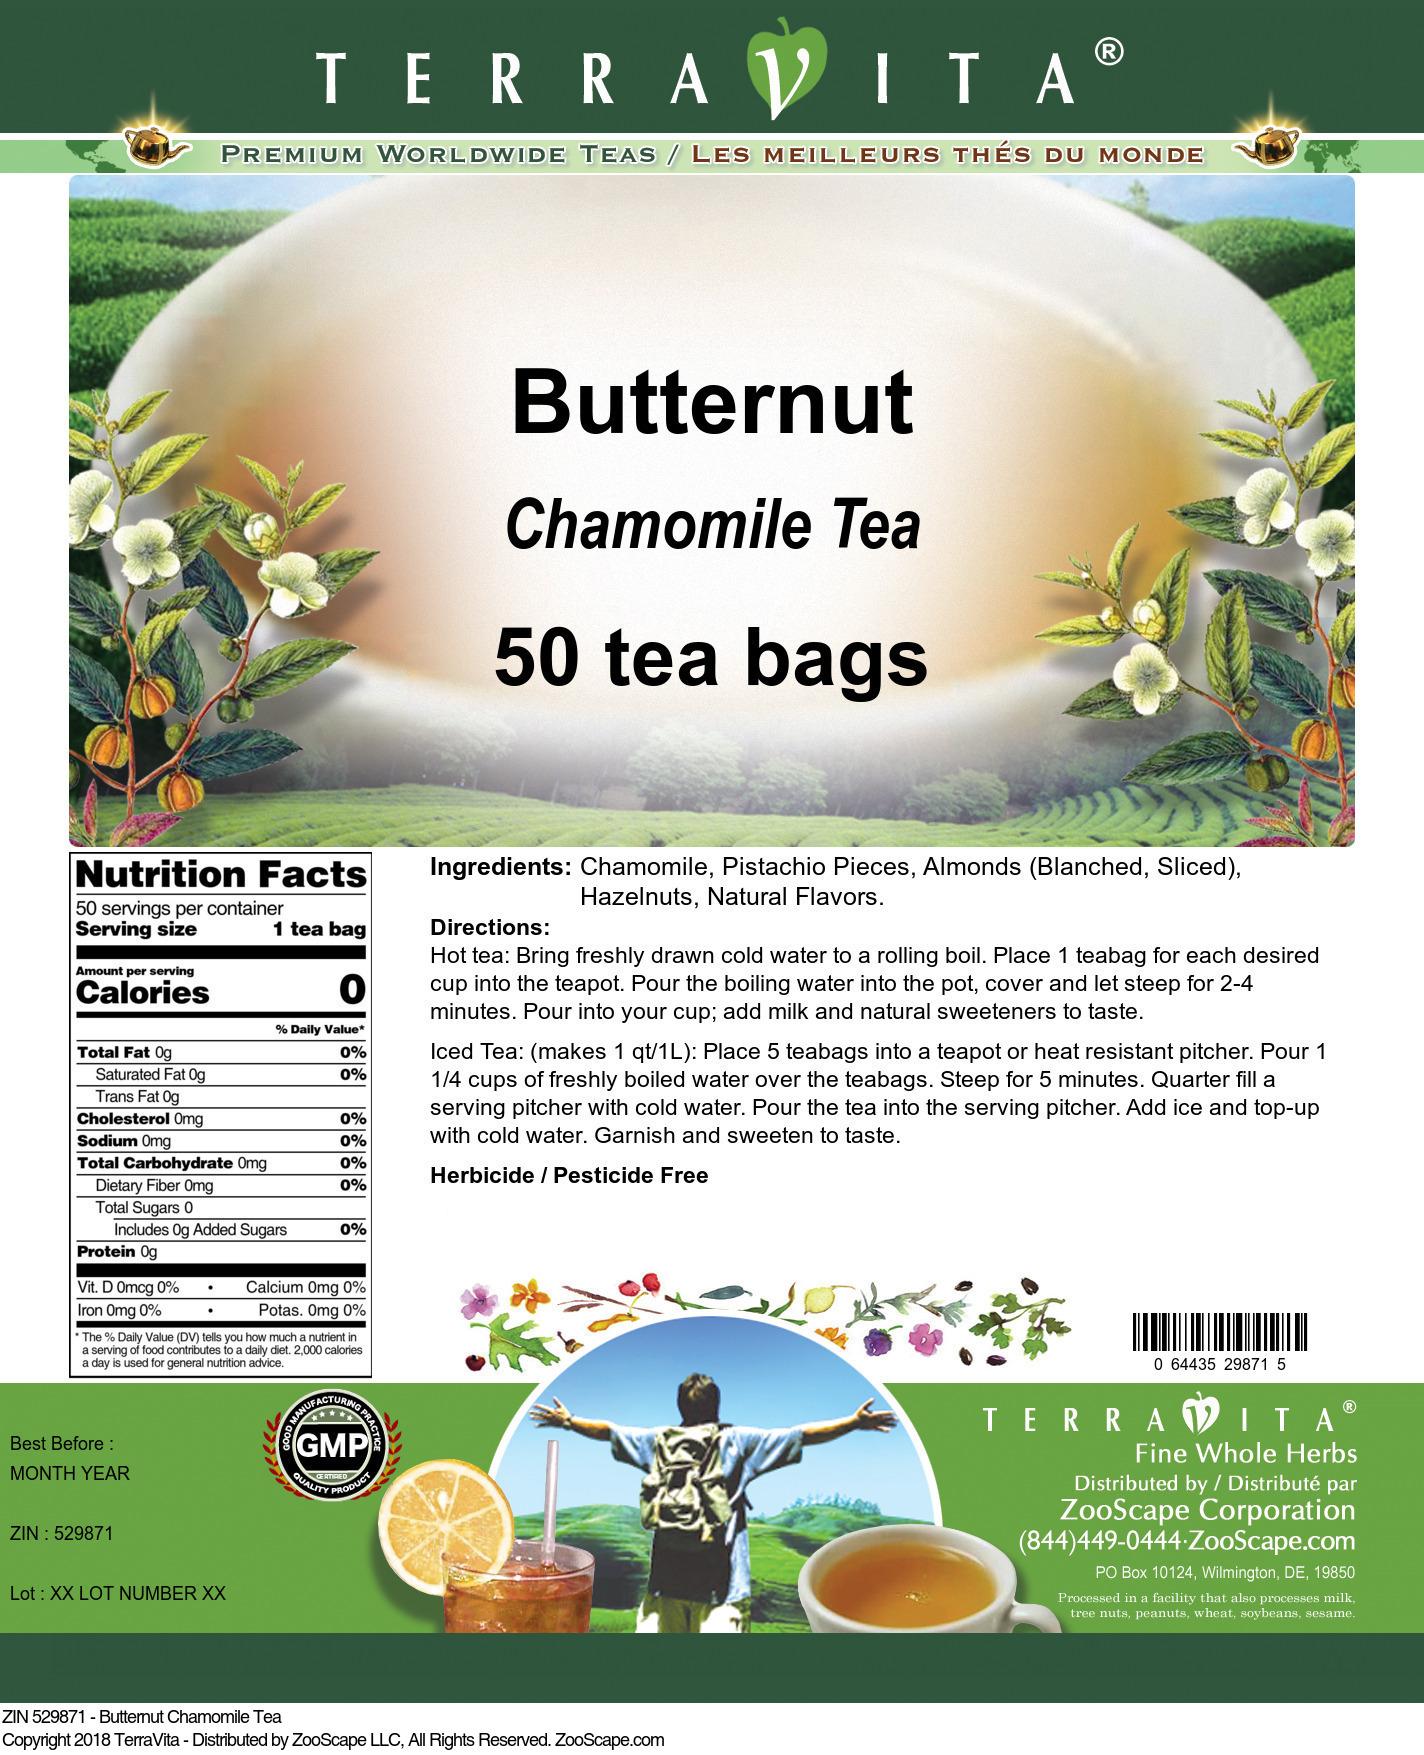 Butternut Chamomile Tea